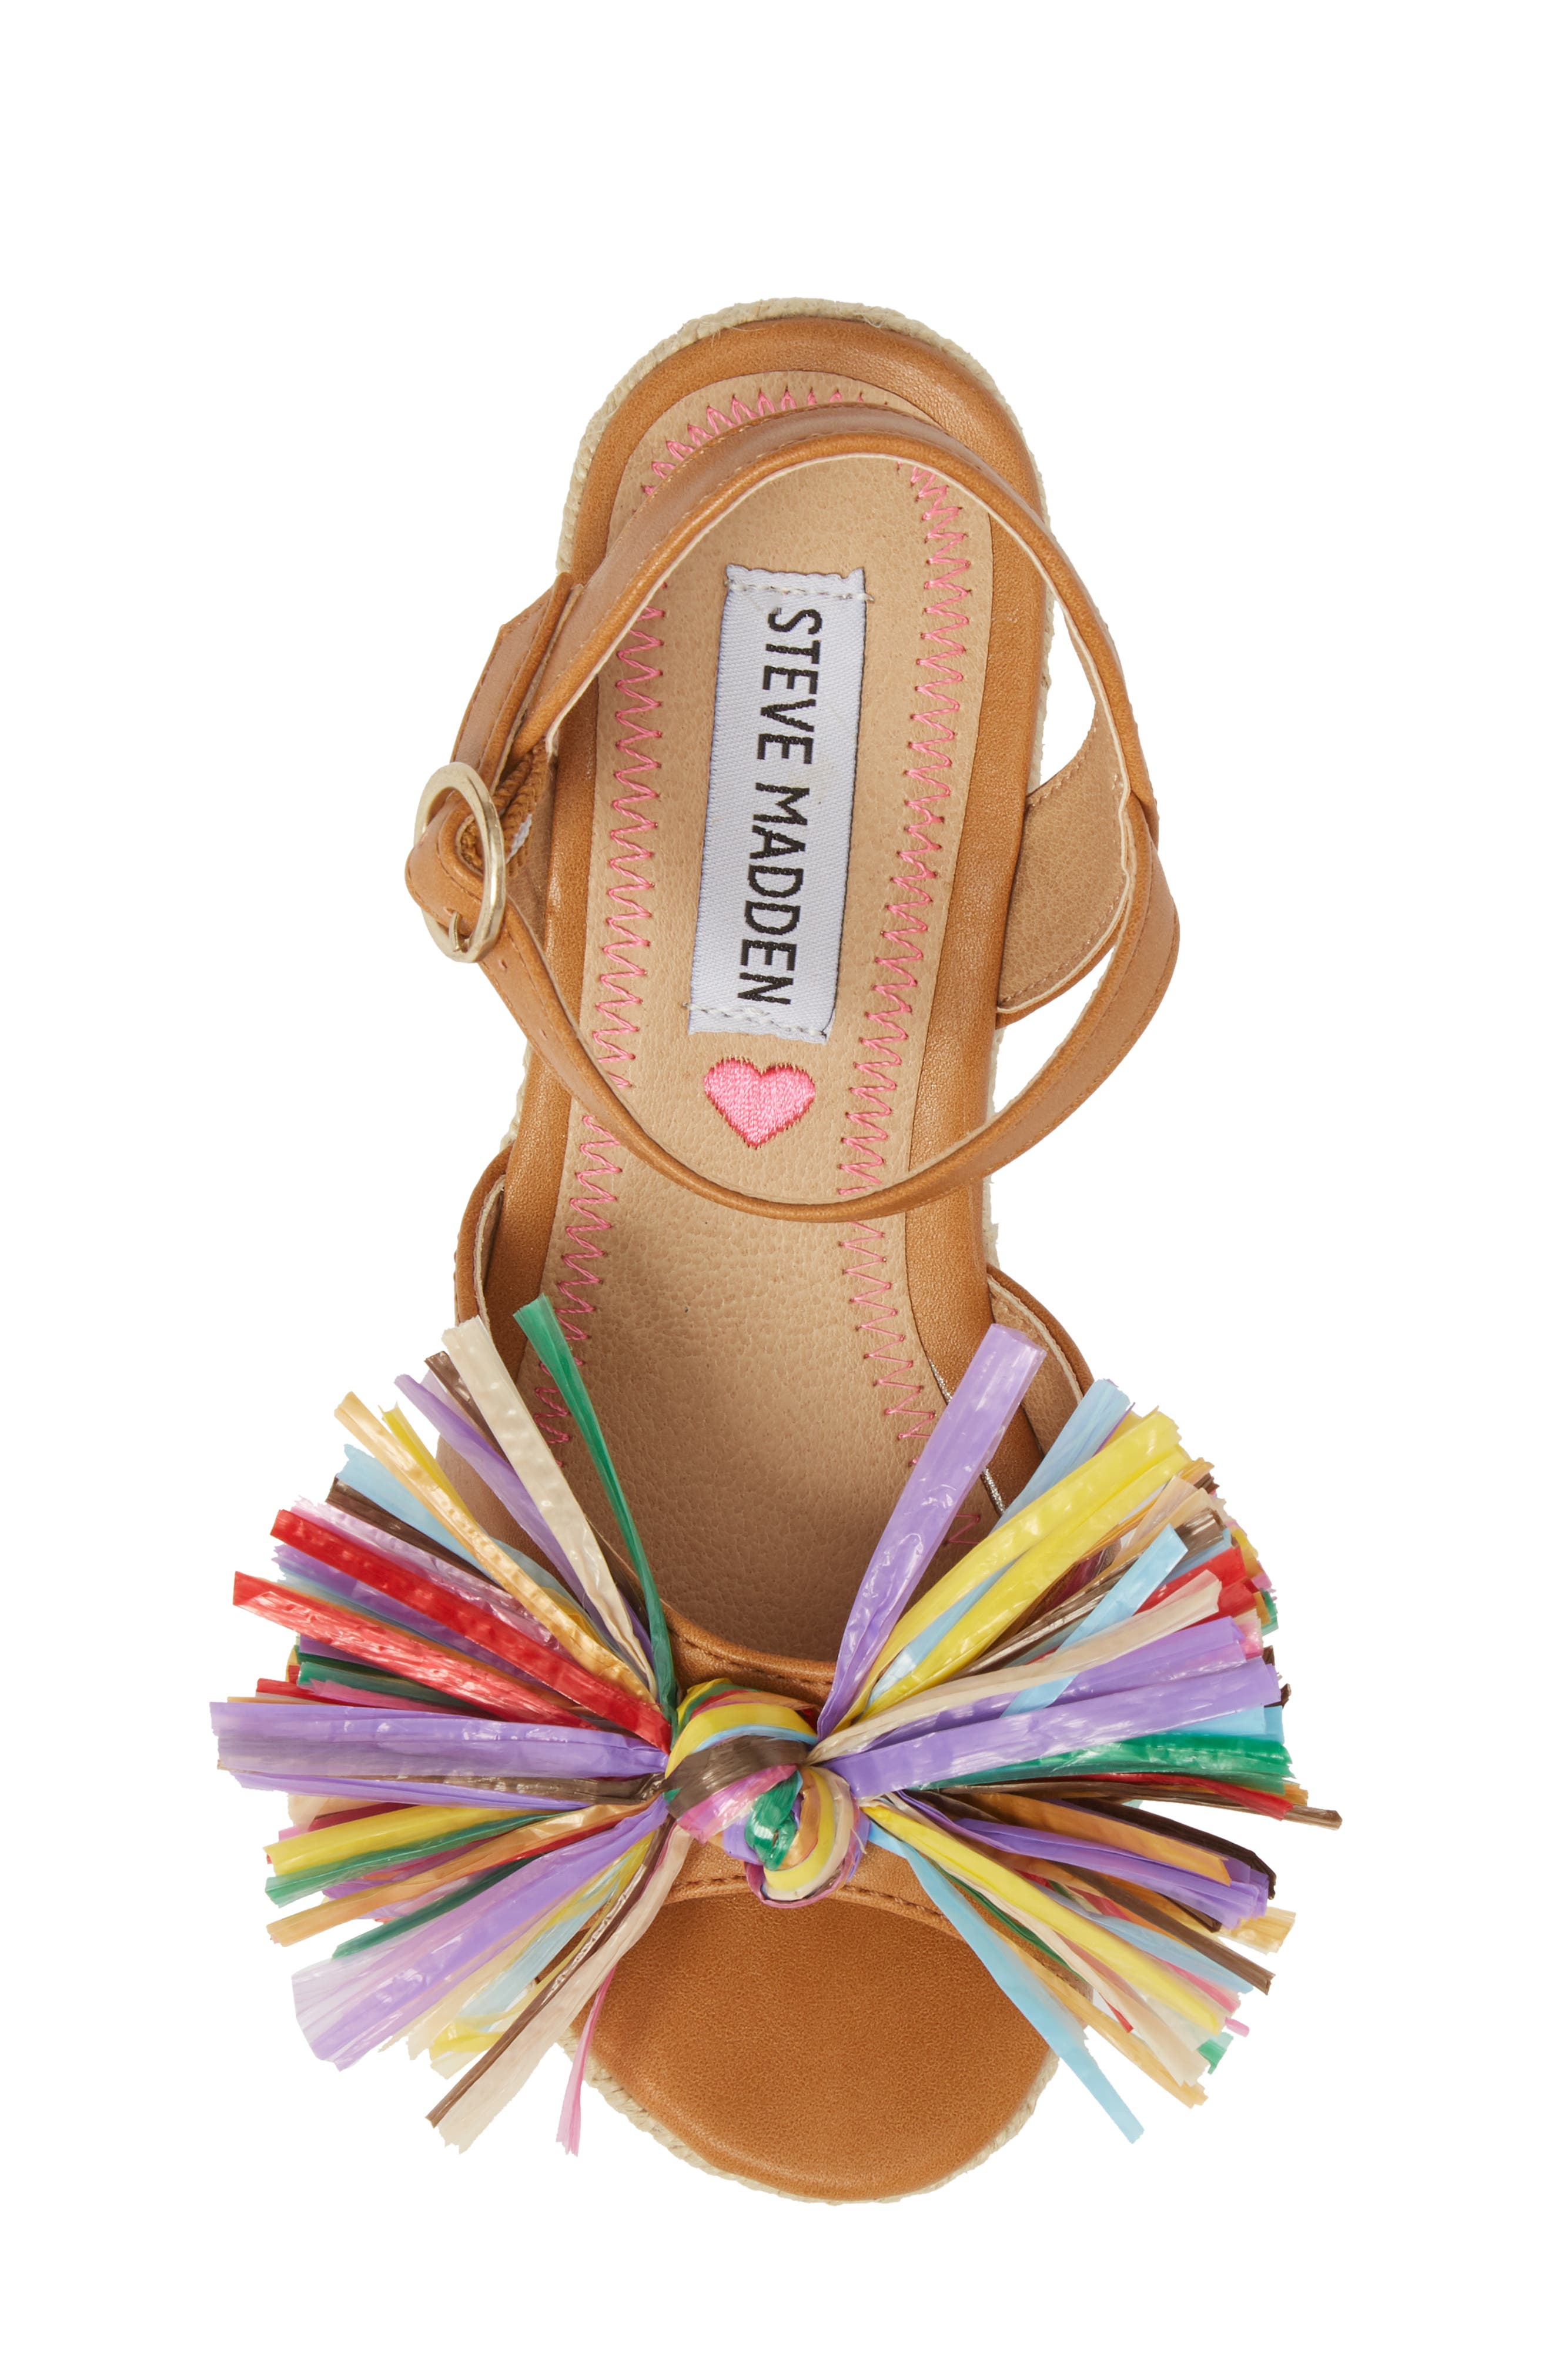 JSTRWBERI Wedge Sandal,                             Alternate thumbnail 5, color,                             200